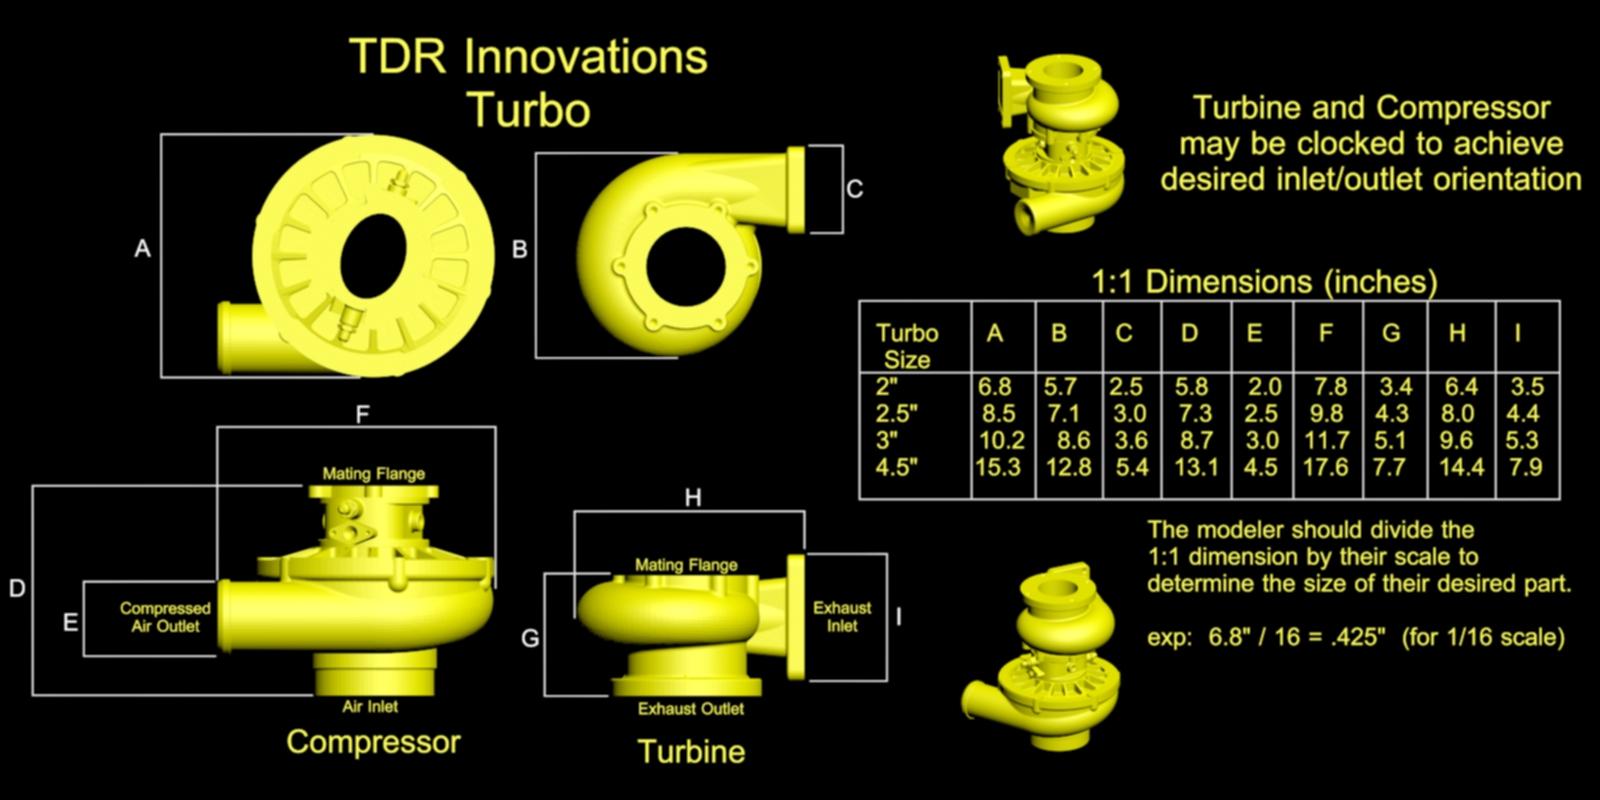 turbo-dimension-picture.jpg